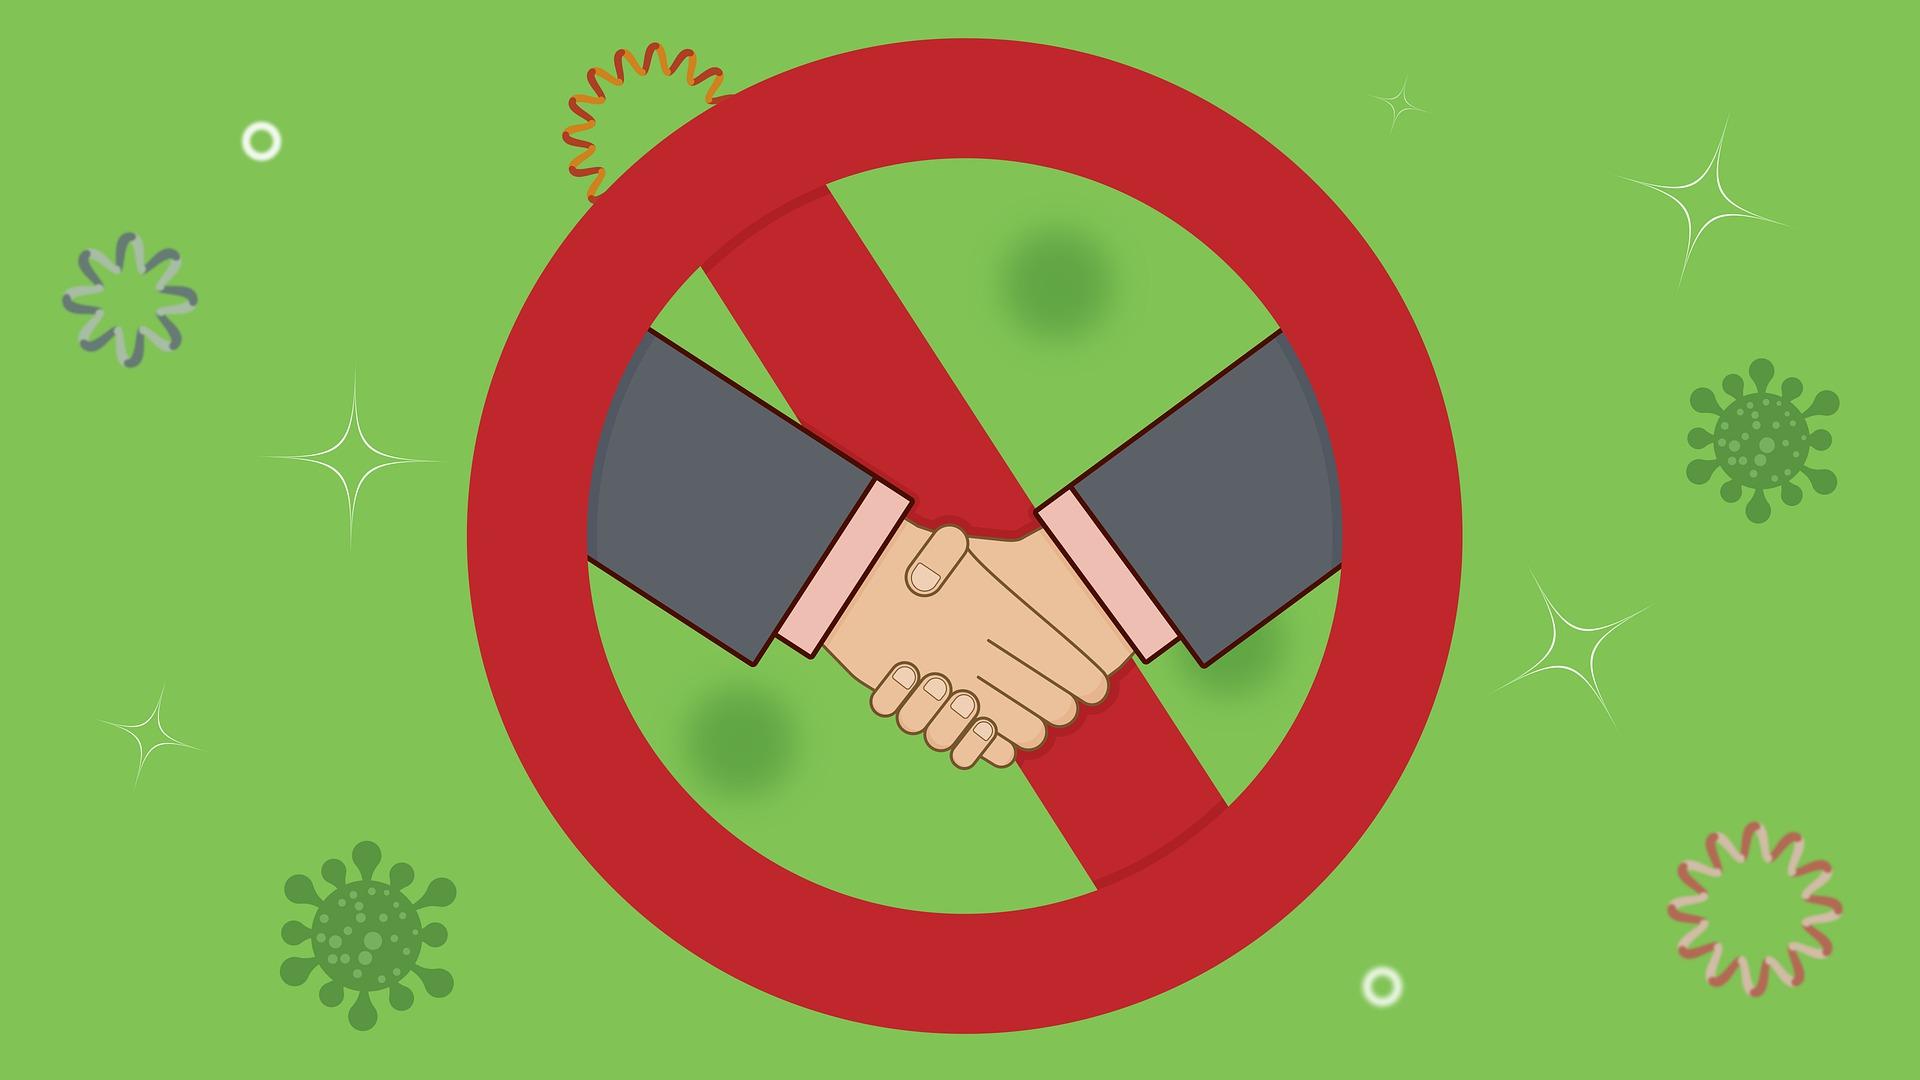 Stop handshake